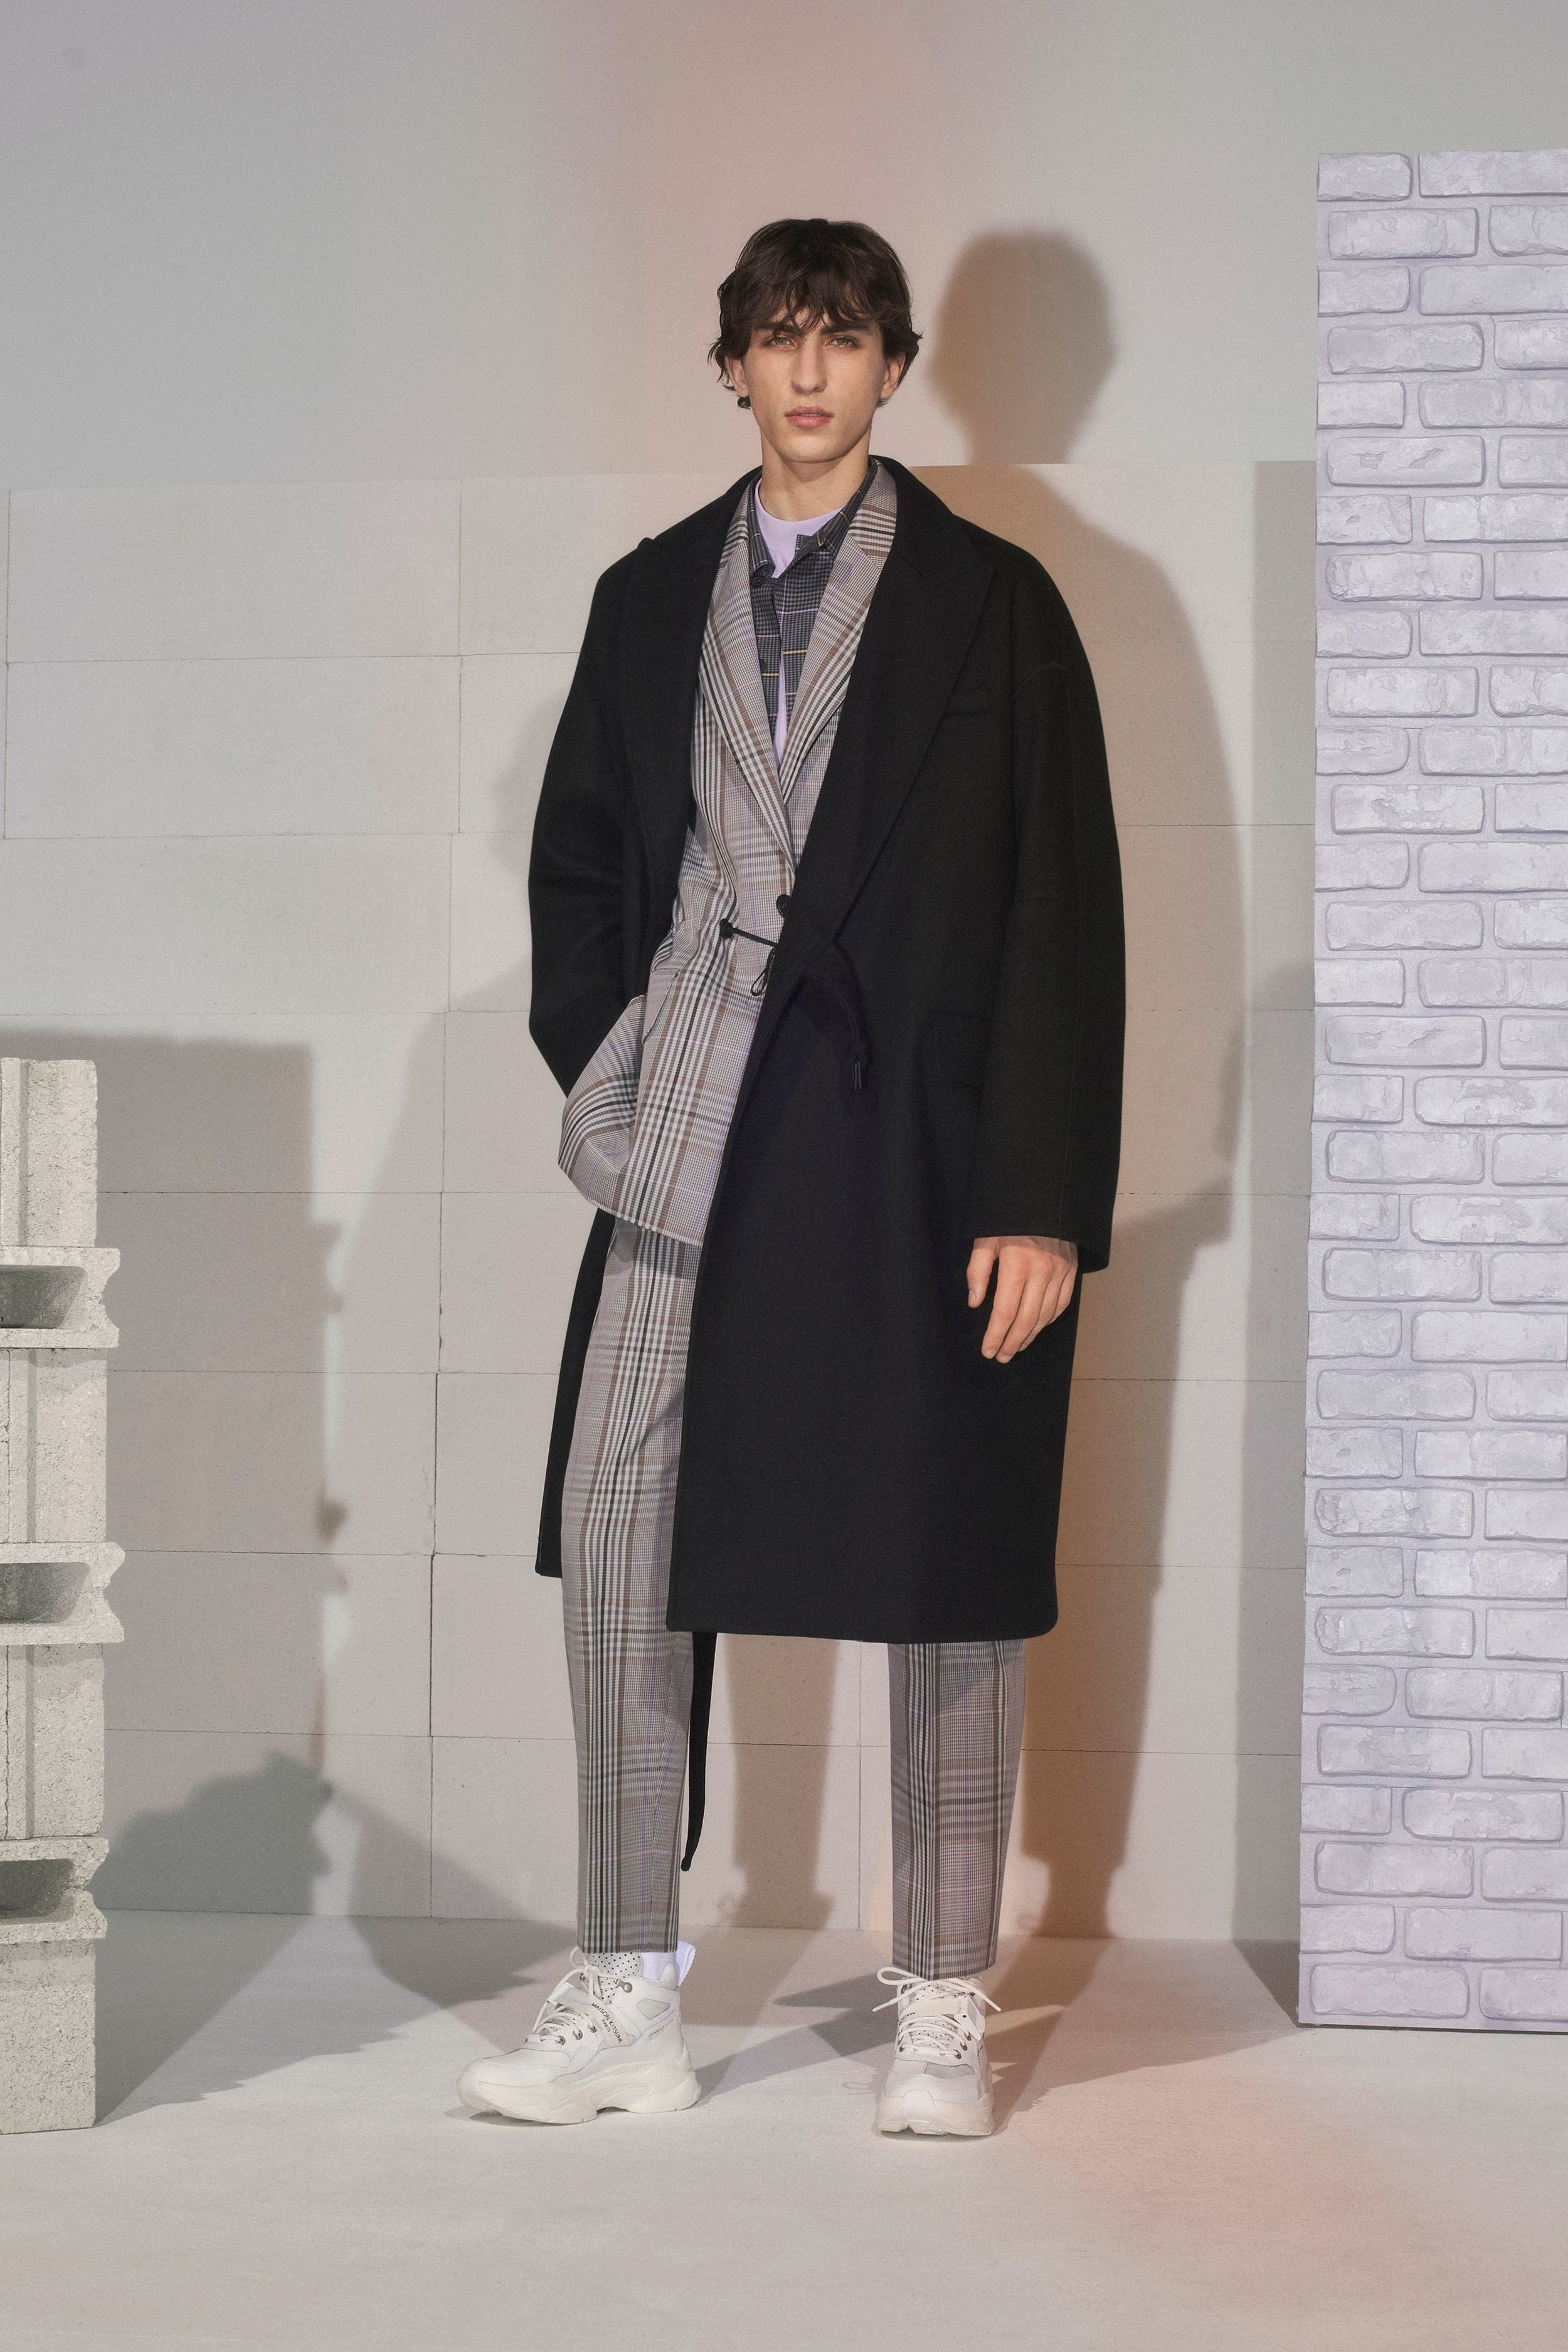 00004-kitsune-menswear-fall-2019-CREDIT-Kevin-Buitrago.jpg